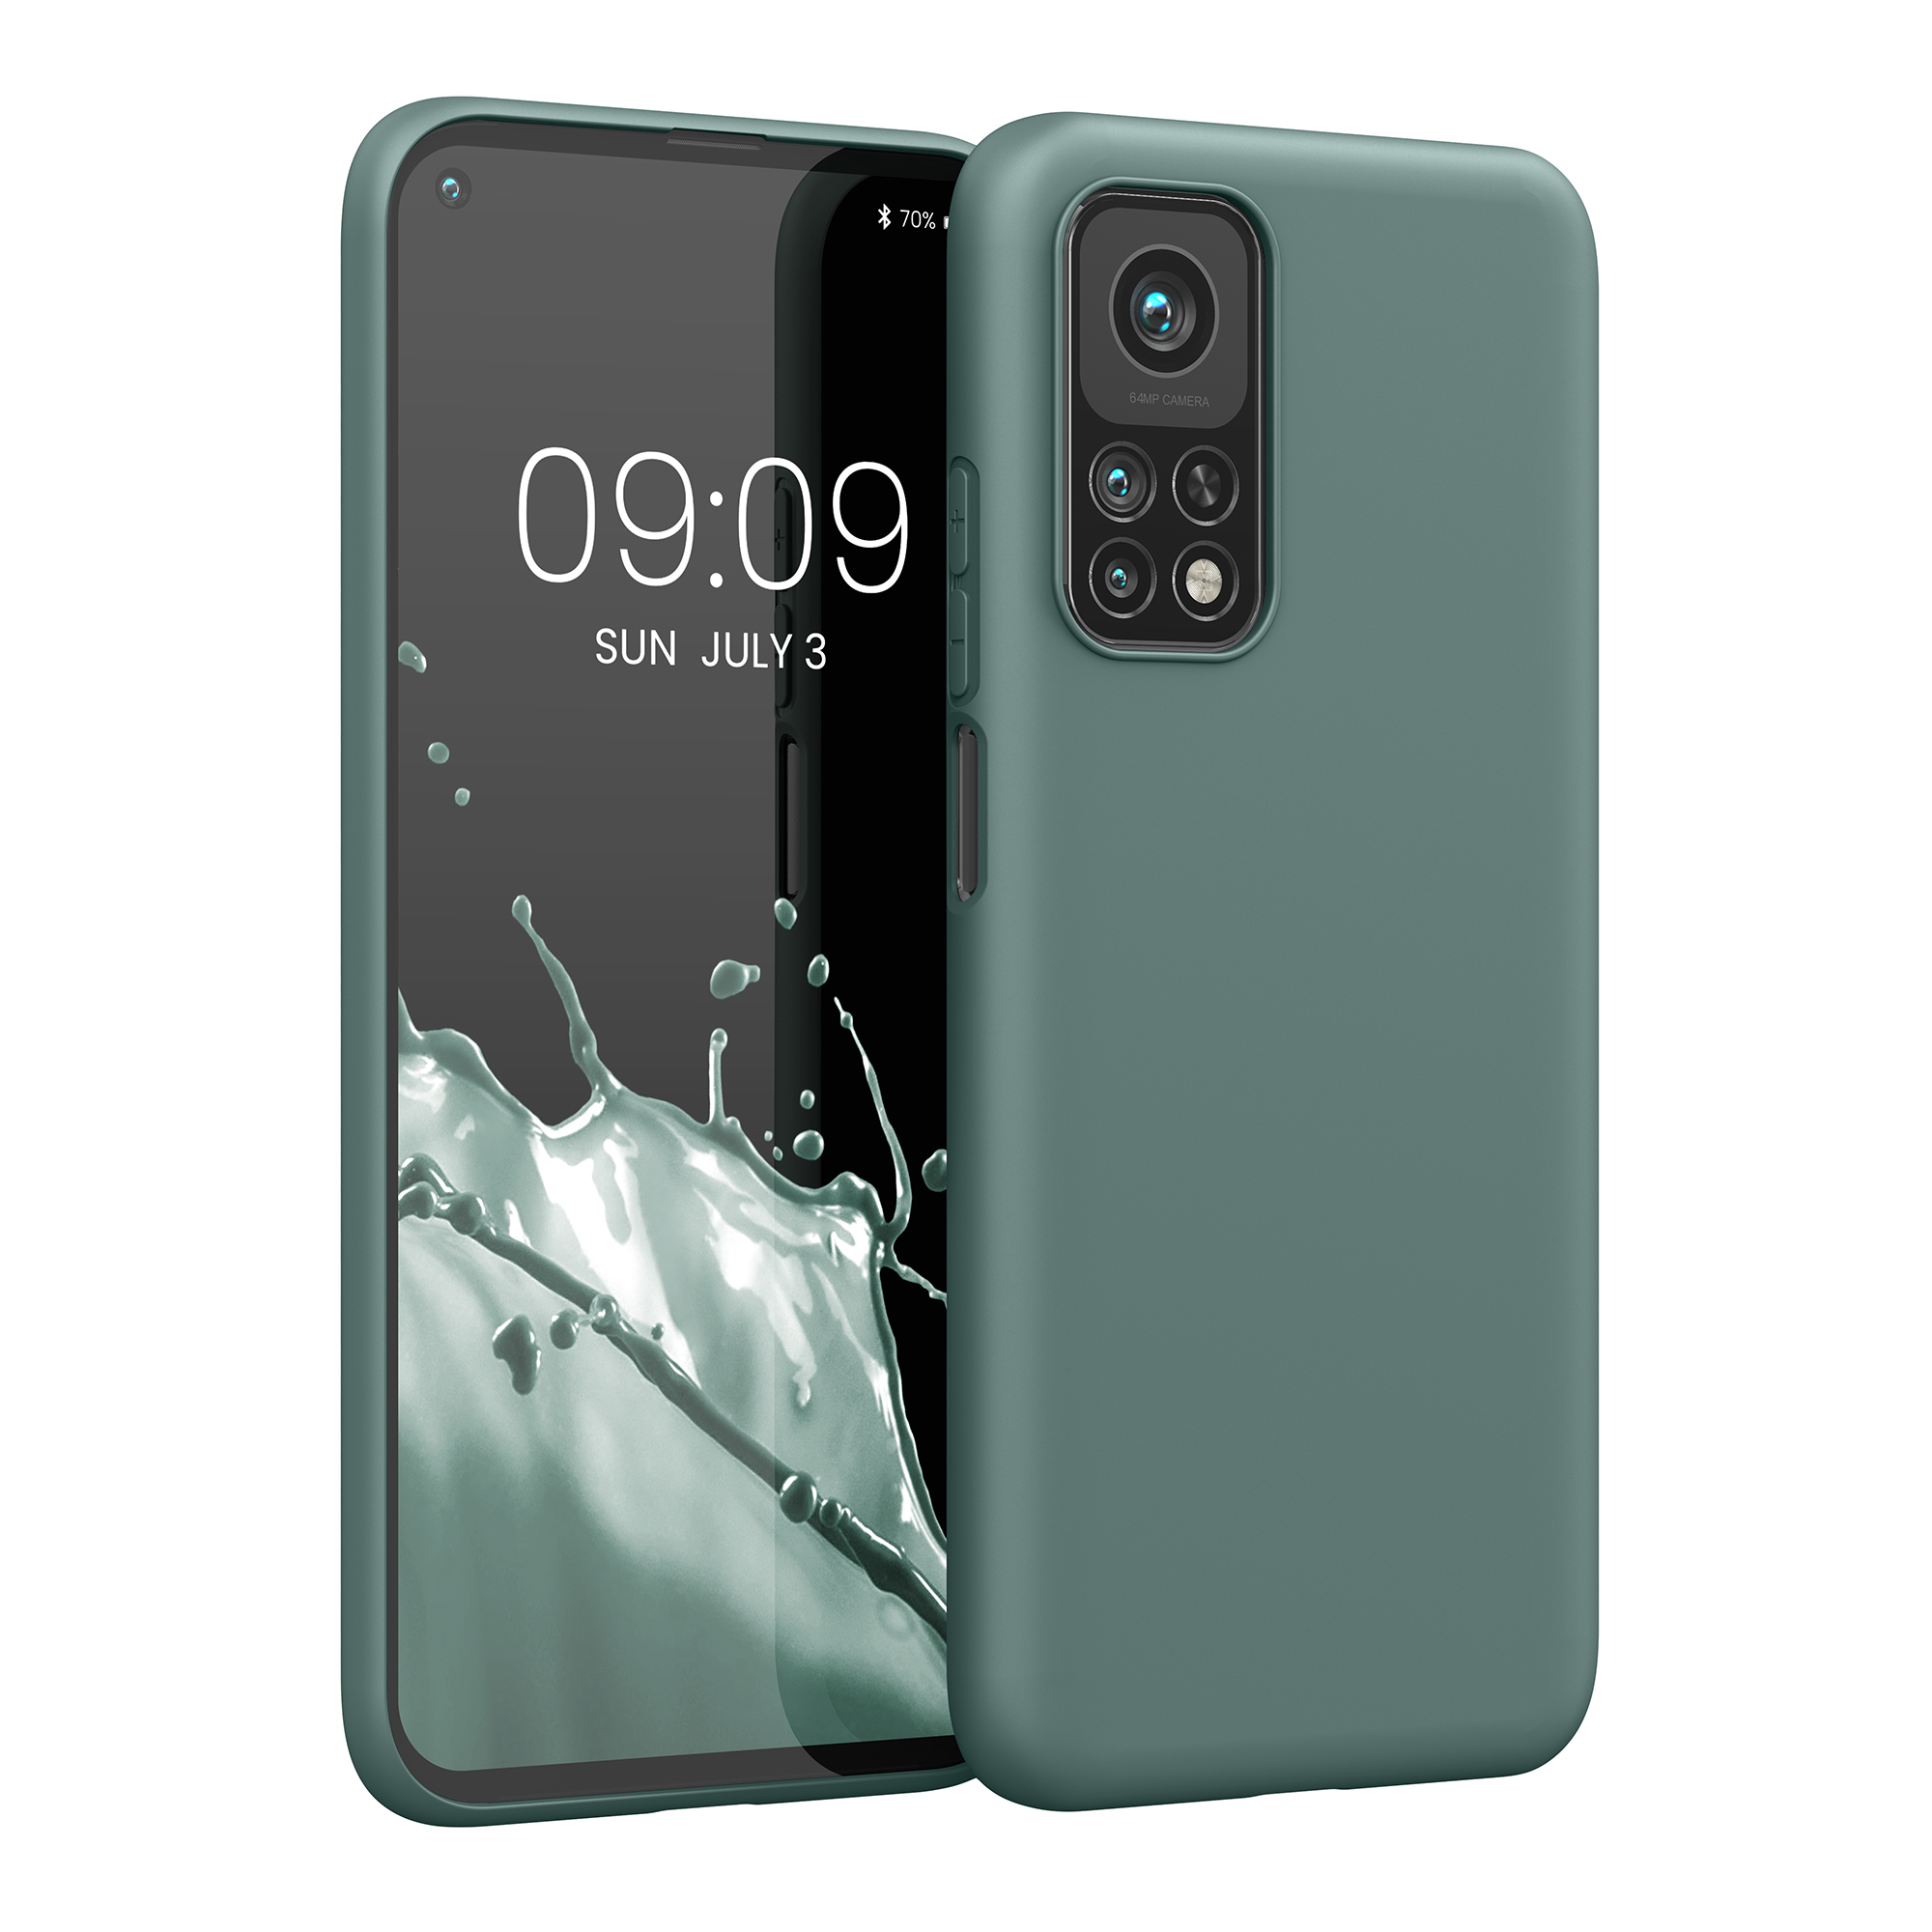 Modrozelené silikonové pouzdro / obal pro Xiaomi Mi 10T / Mi 10T Pro